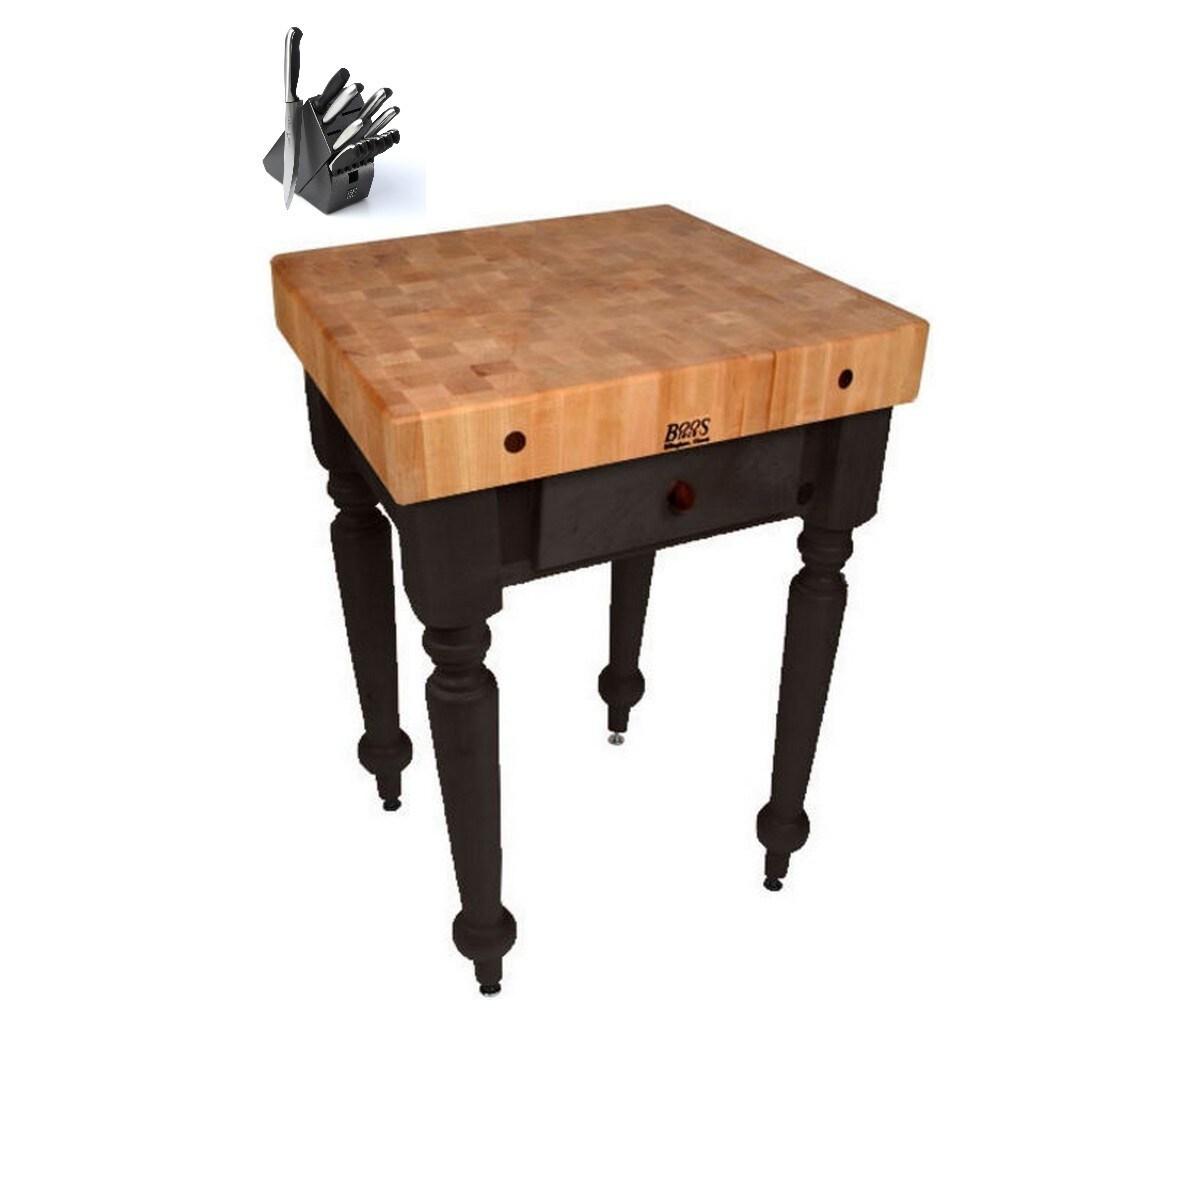 John Boos Cucina Rustica Black 30 x 24 Kitchen Work Table...